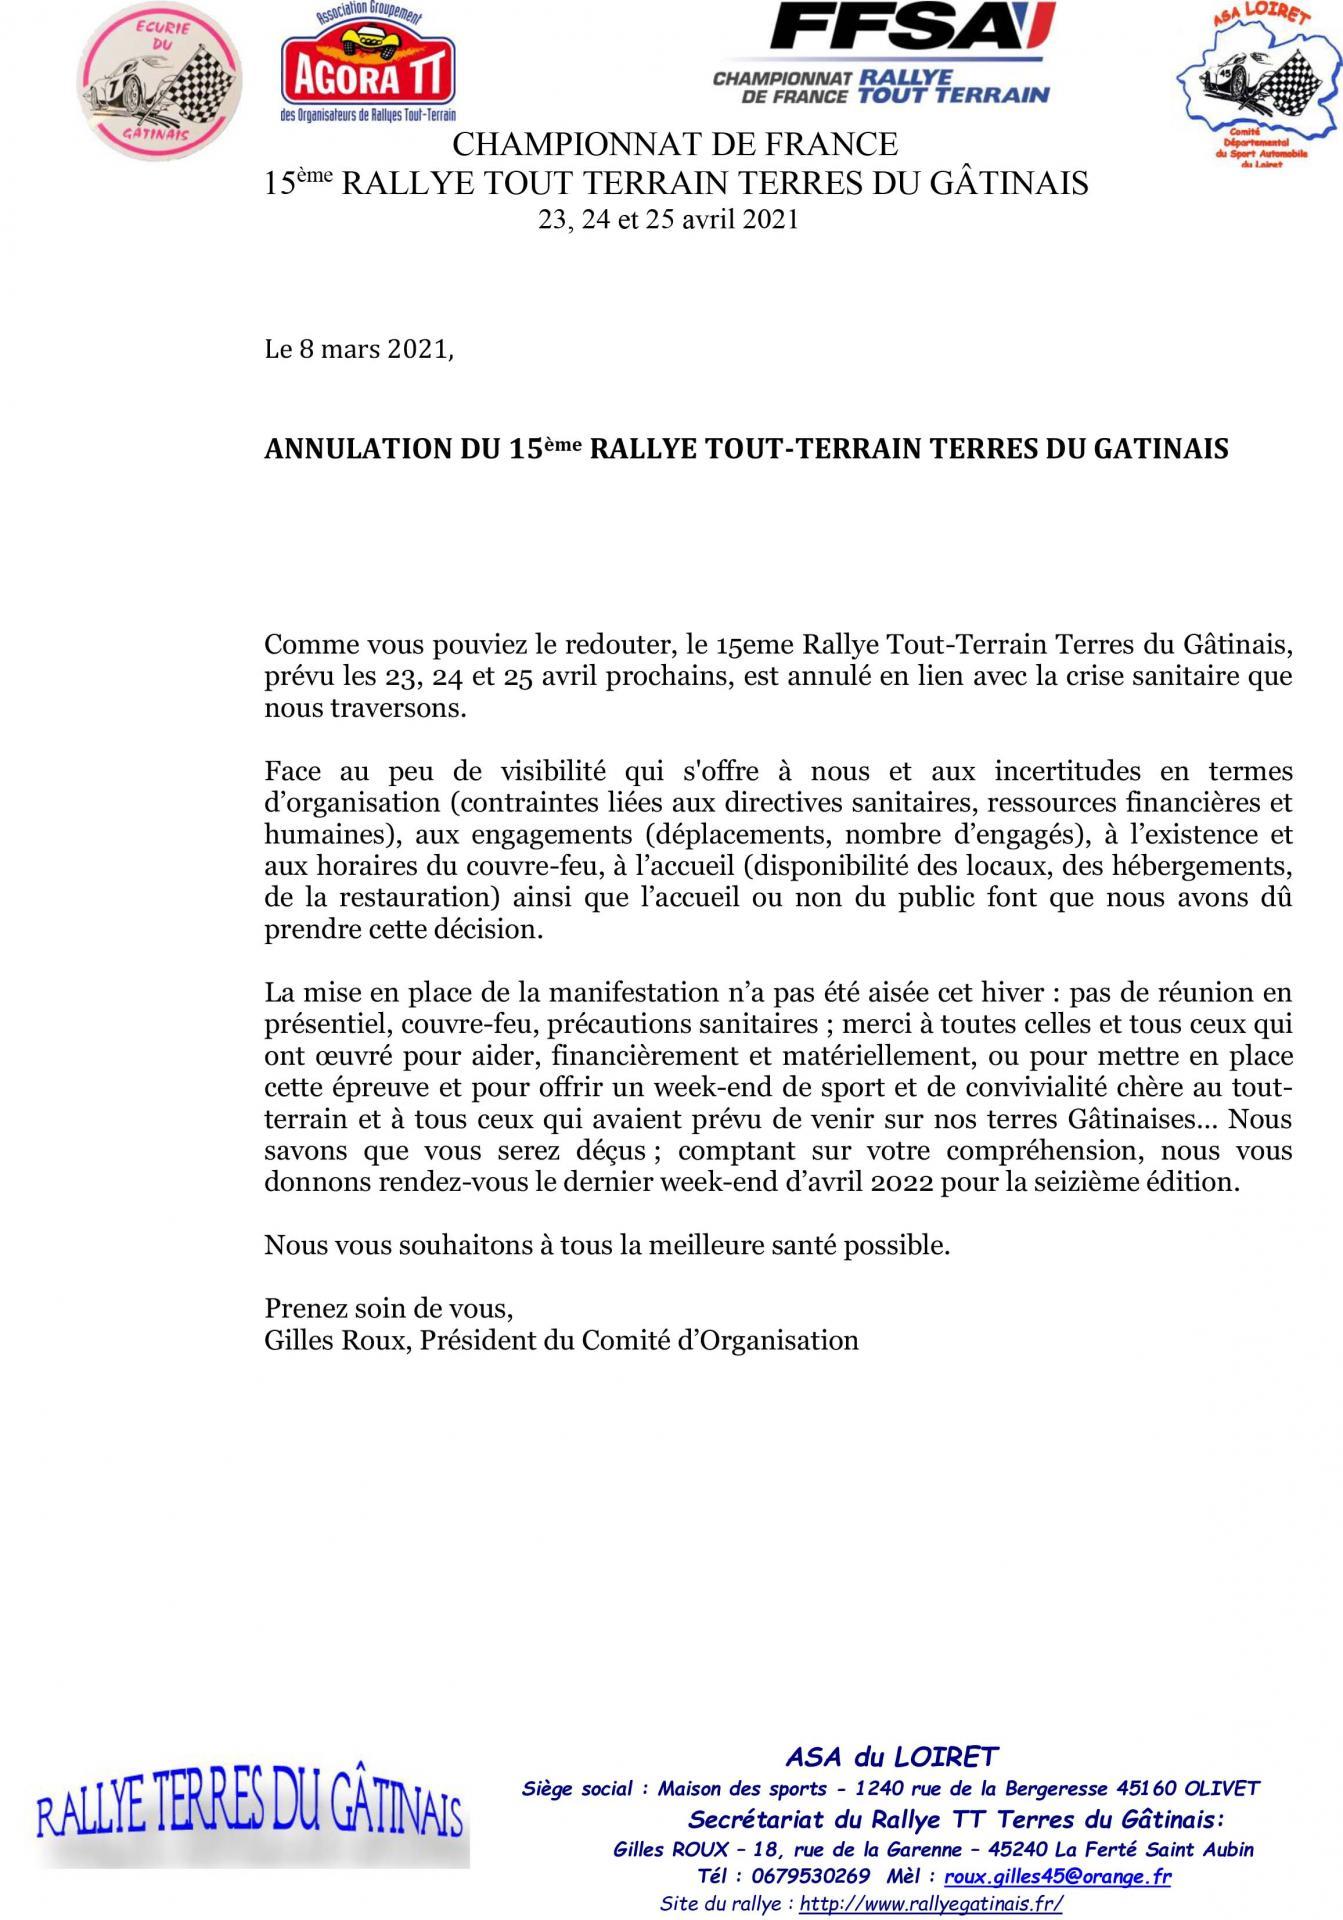 Communique annulation rtt terres du gatinais 2021